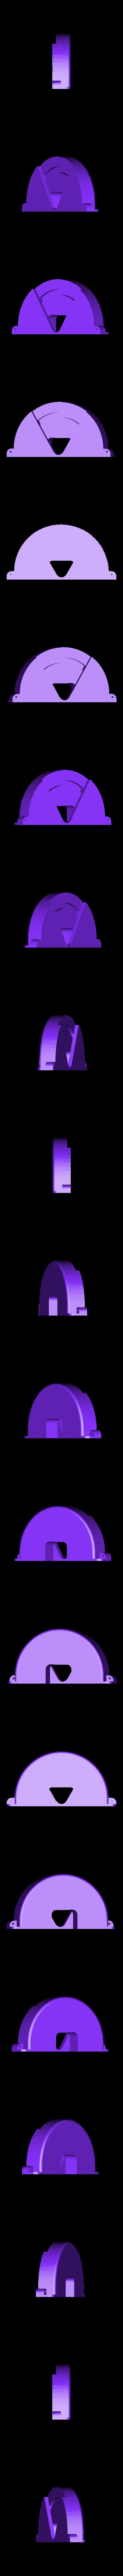 Manete 737 - Base_L-1.STL Download STL file Adapting Boeing to Logitech Extrem 3D Pro 3D print model • 3D printing template, Eduardohbm